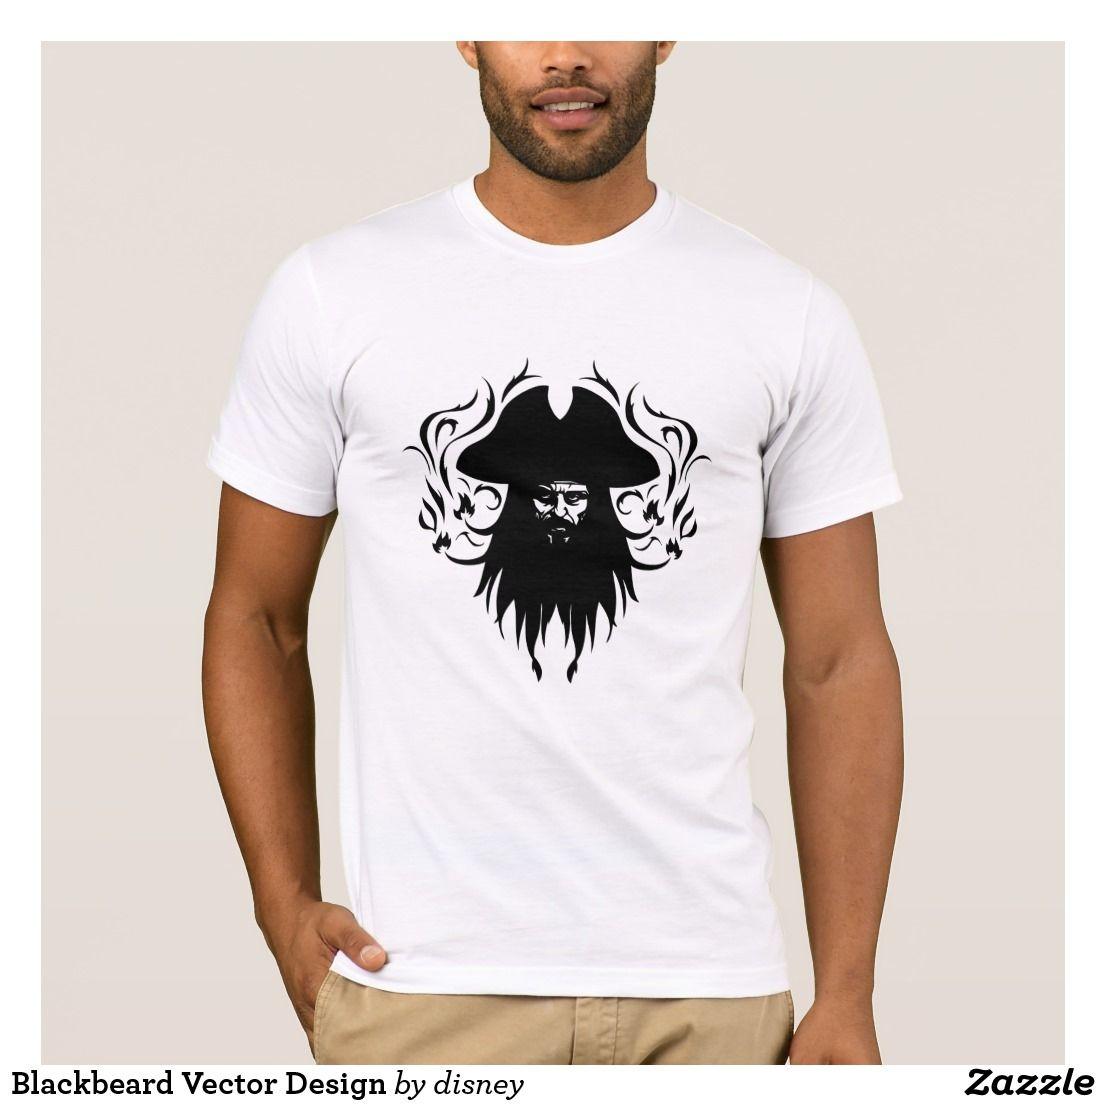 Design t shirt zazzle - Design T Shirt Zazzle 3